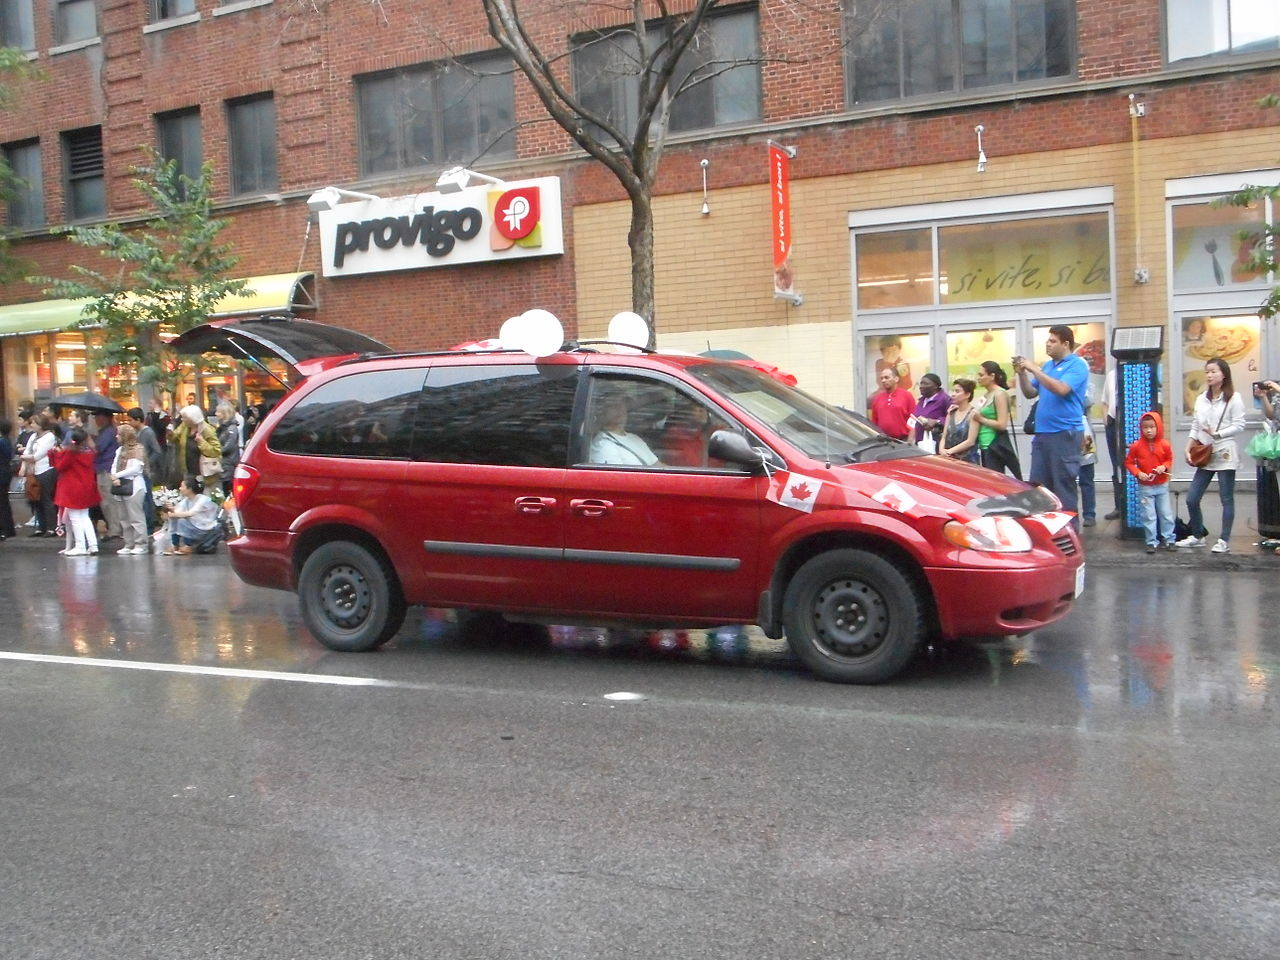 File:Canada Day 2015 on Saint Catherine Street - 091.jpg - Wikimedia